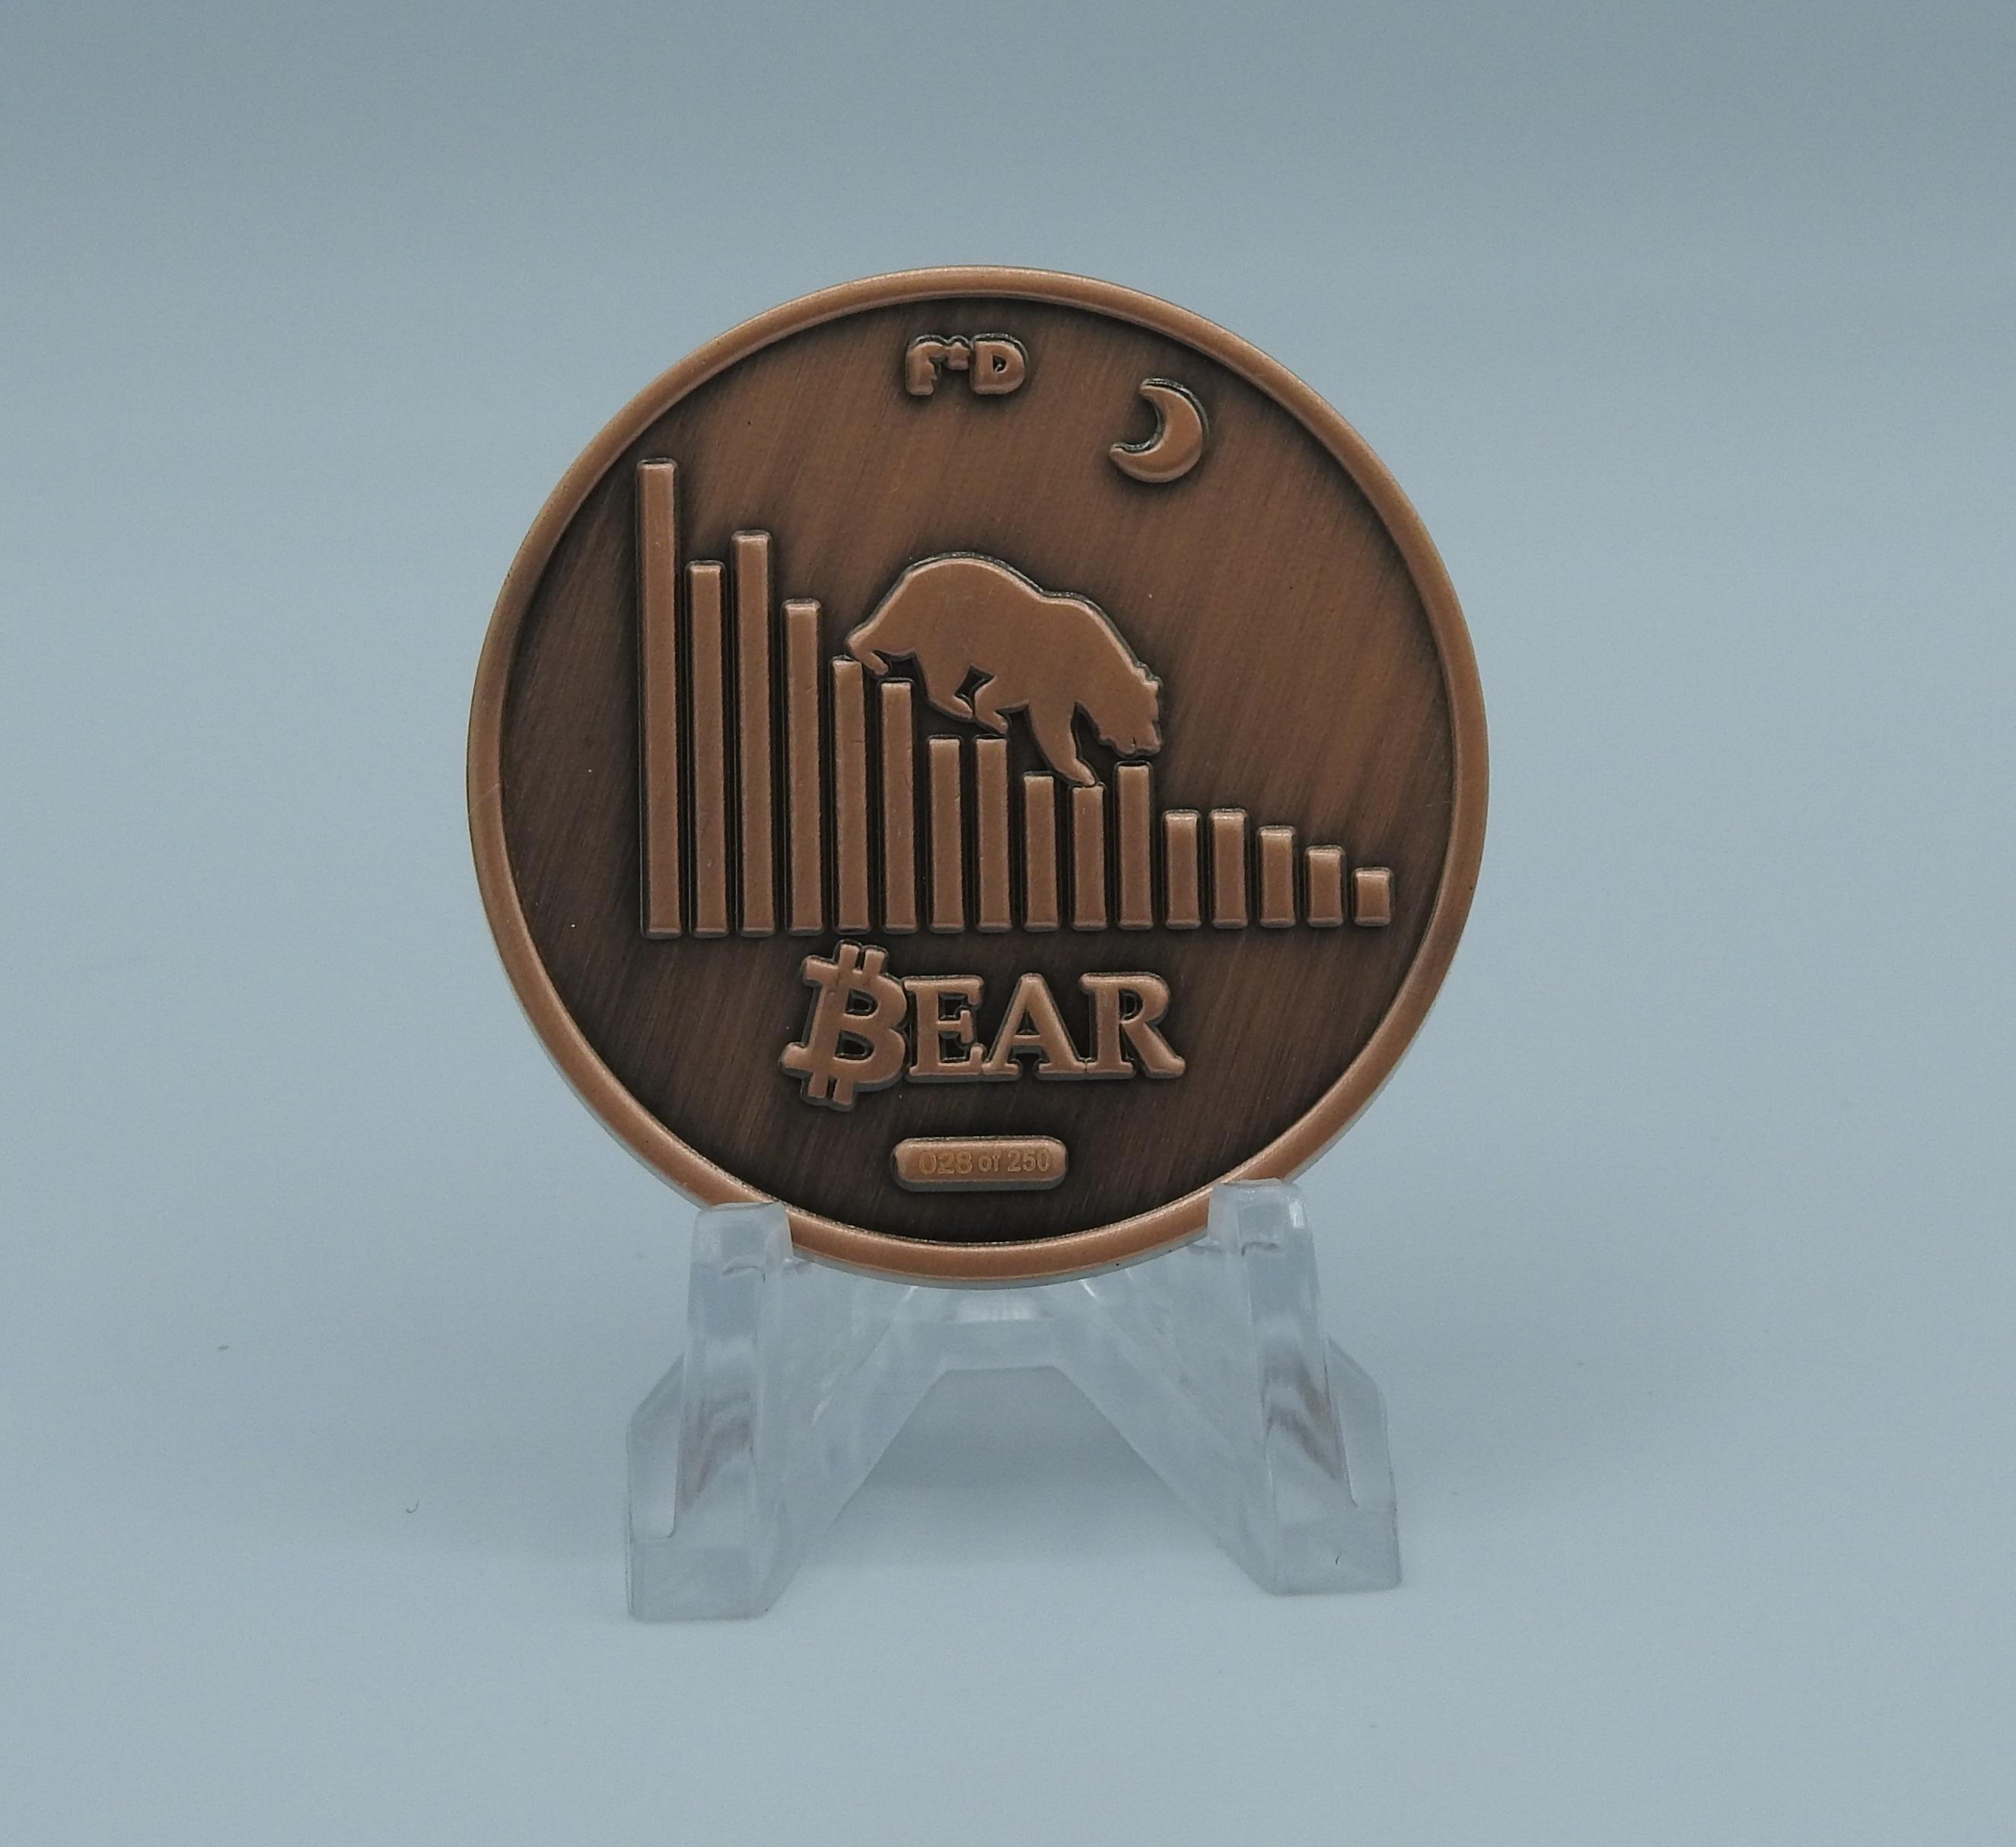 2 Faces Of Bitcoin Bull Vs Bear 4 Coin Set Finite By